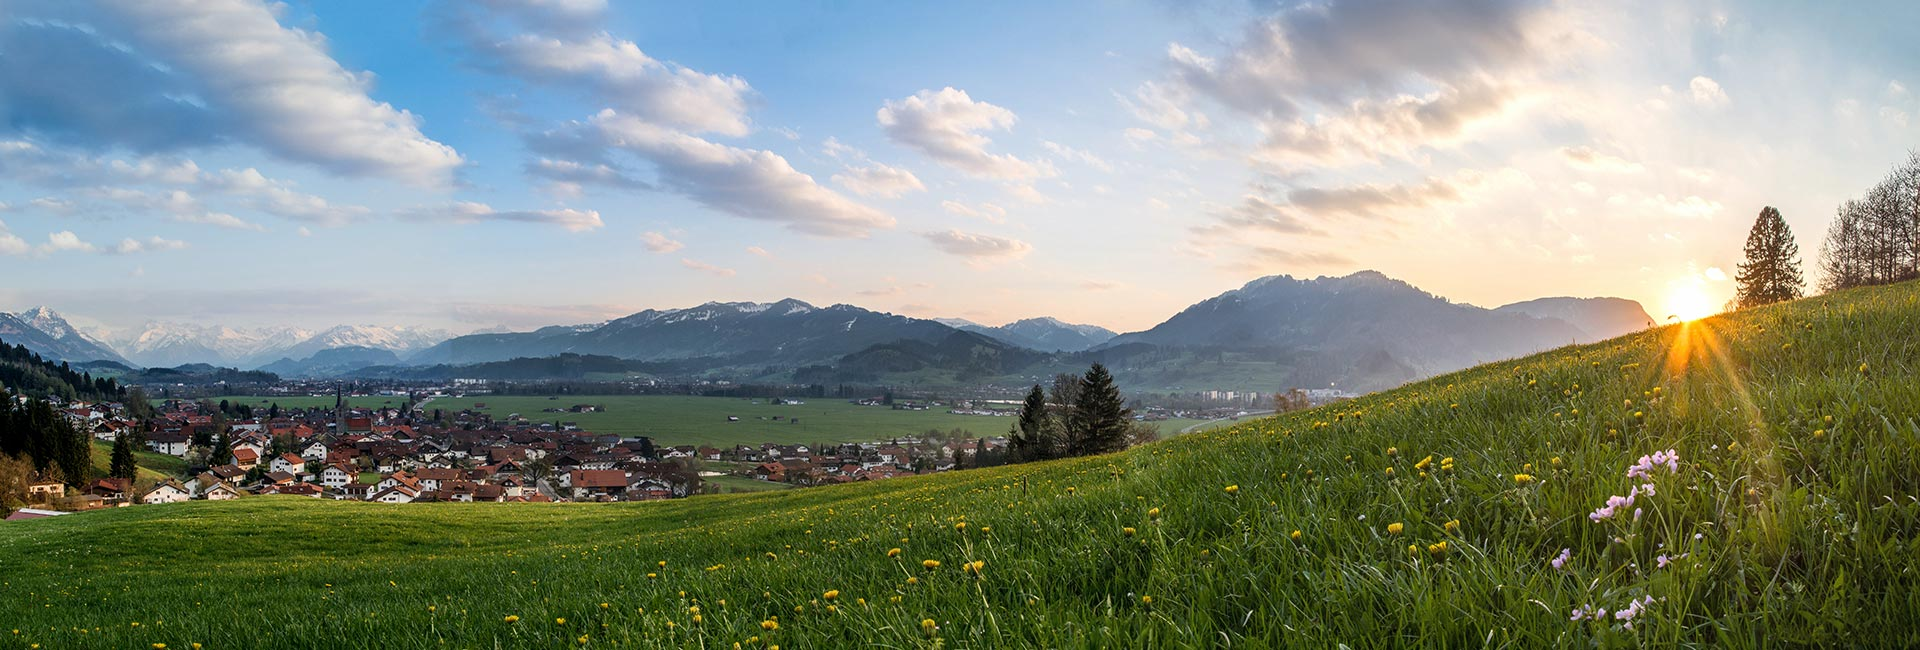 Burgberg im Allgäu Panorama